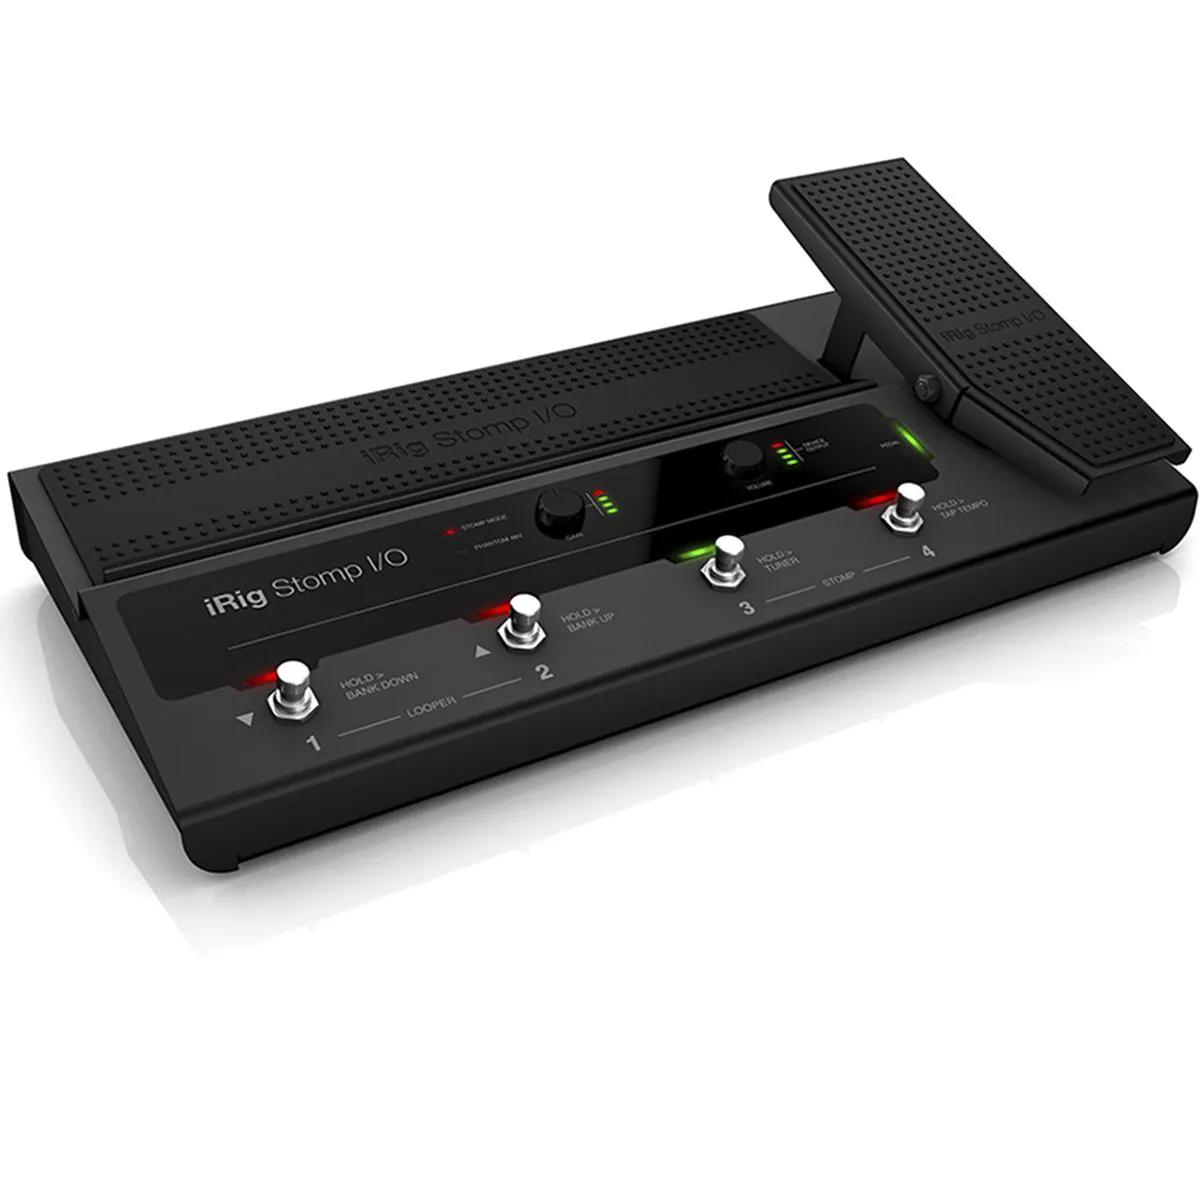 Pedaleira IK Multimedia iRig Stomp I/O Control USB